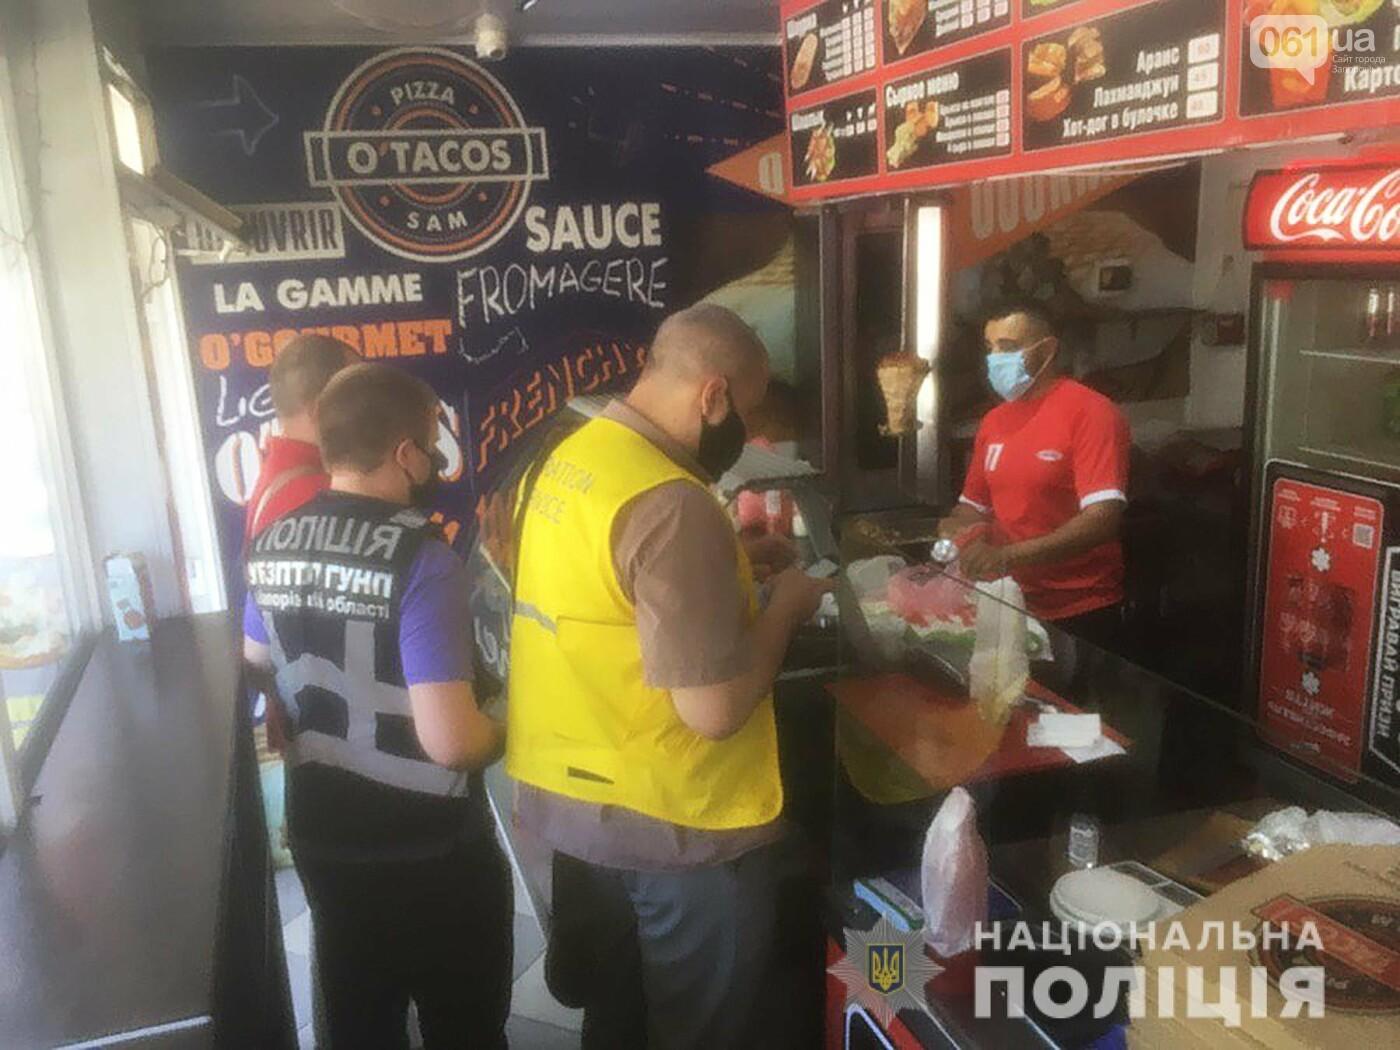 Без маски и без регистрации: в Запорожье полиция составила админпротоколы на гражданина Сирии , фото-1